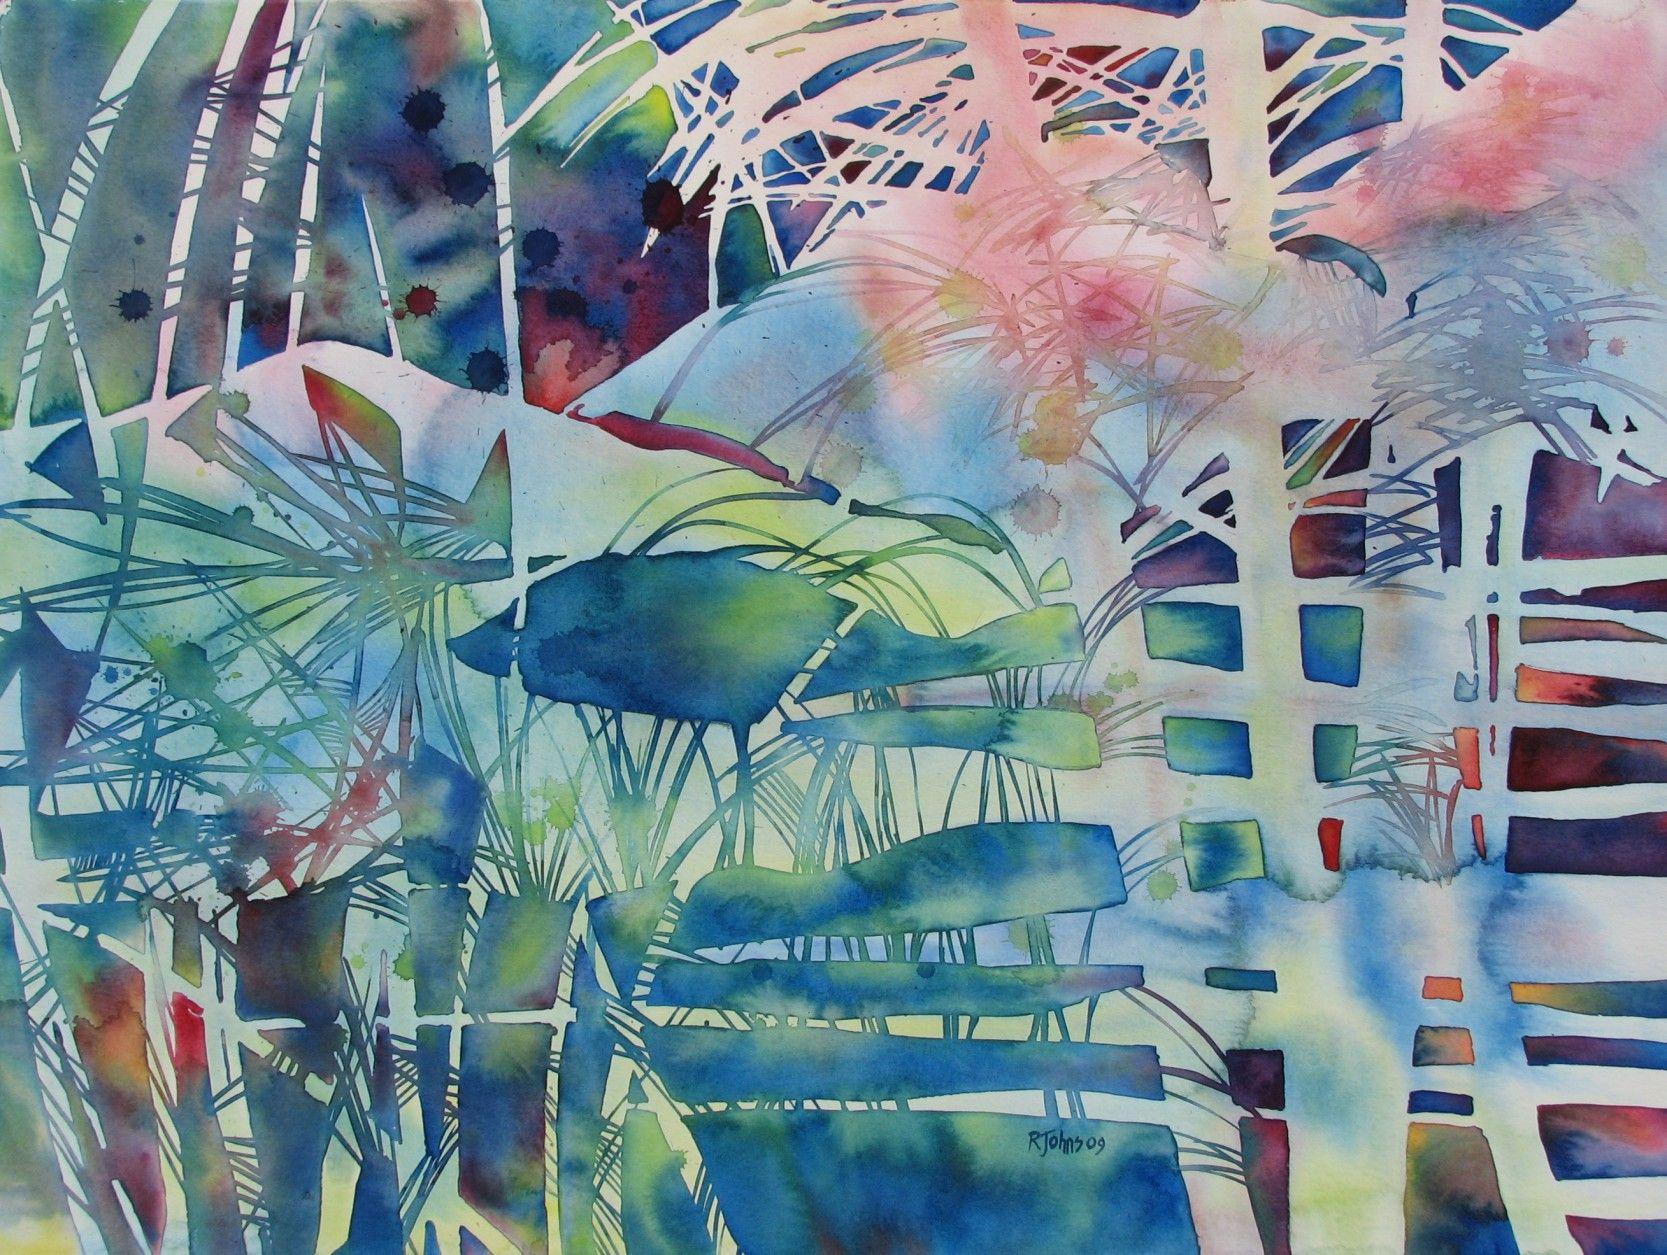 Watercolor artist magazine palm coast fl - Image Detail For Watercolor Art By Rhene Johns Artist